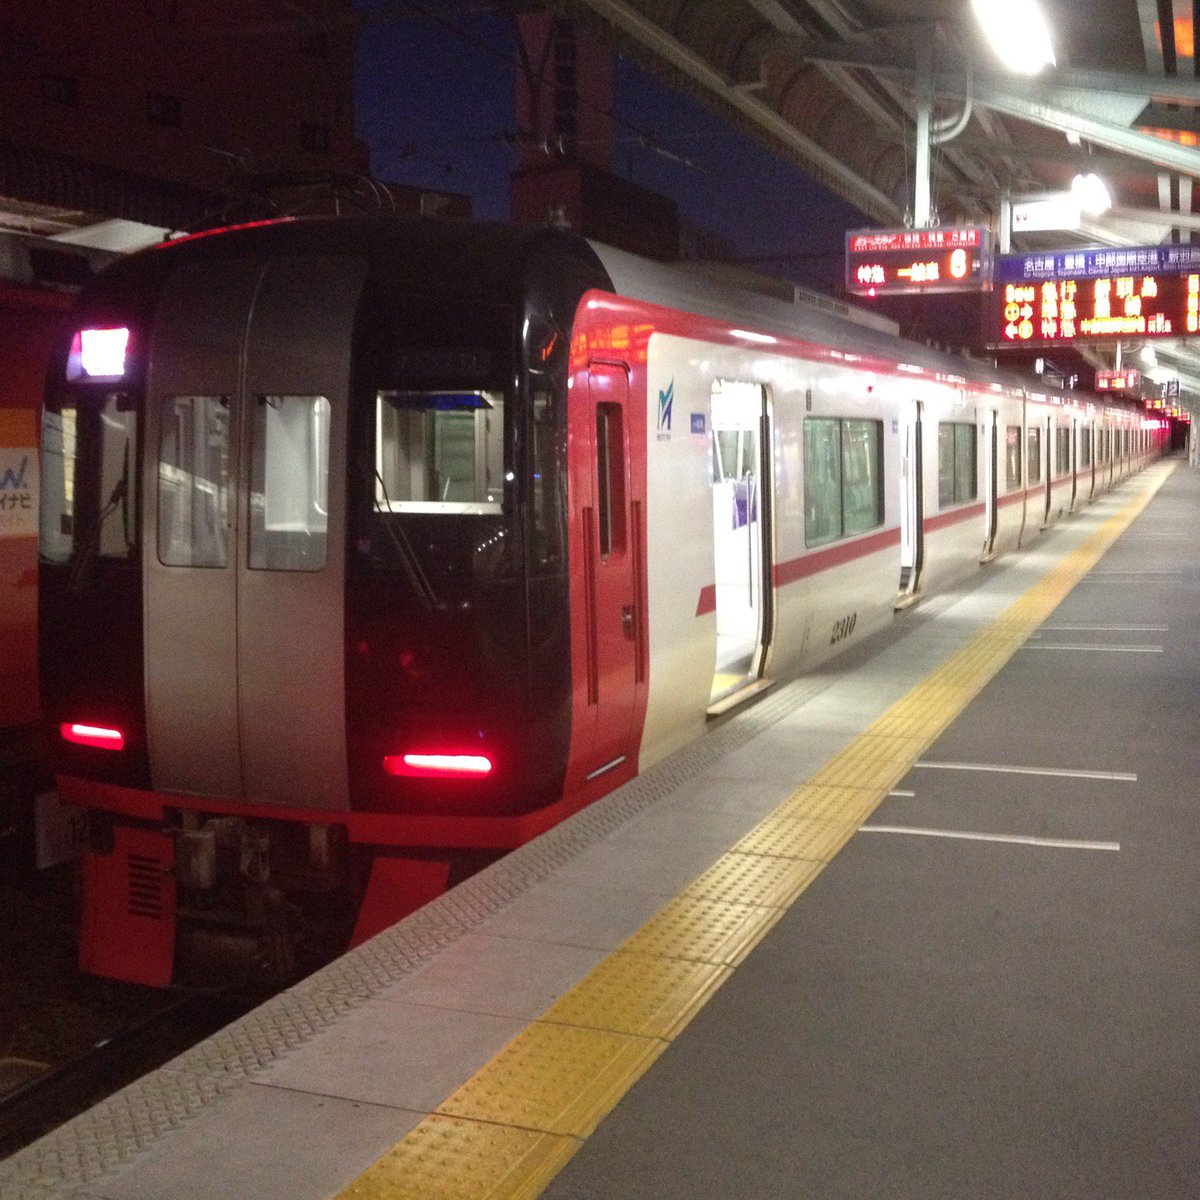 名鉄 名鉄岐阜駅 2番線ホーム 2200系